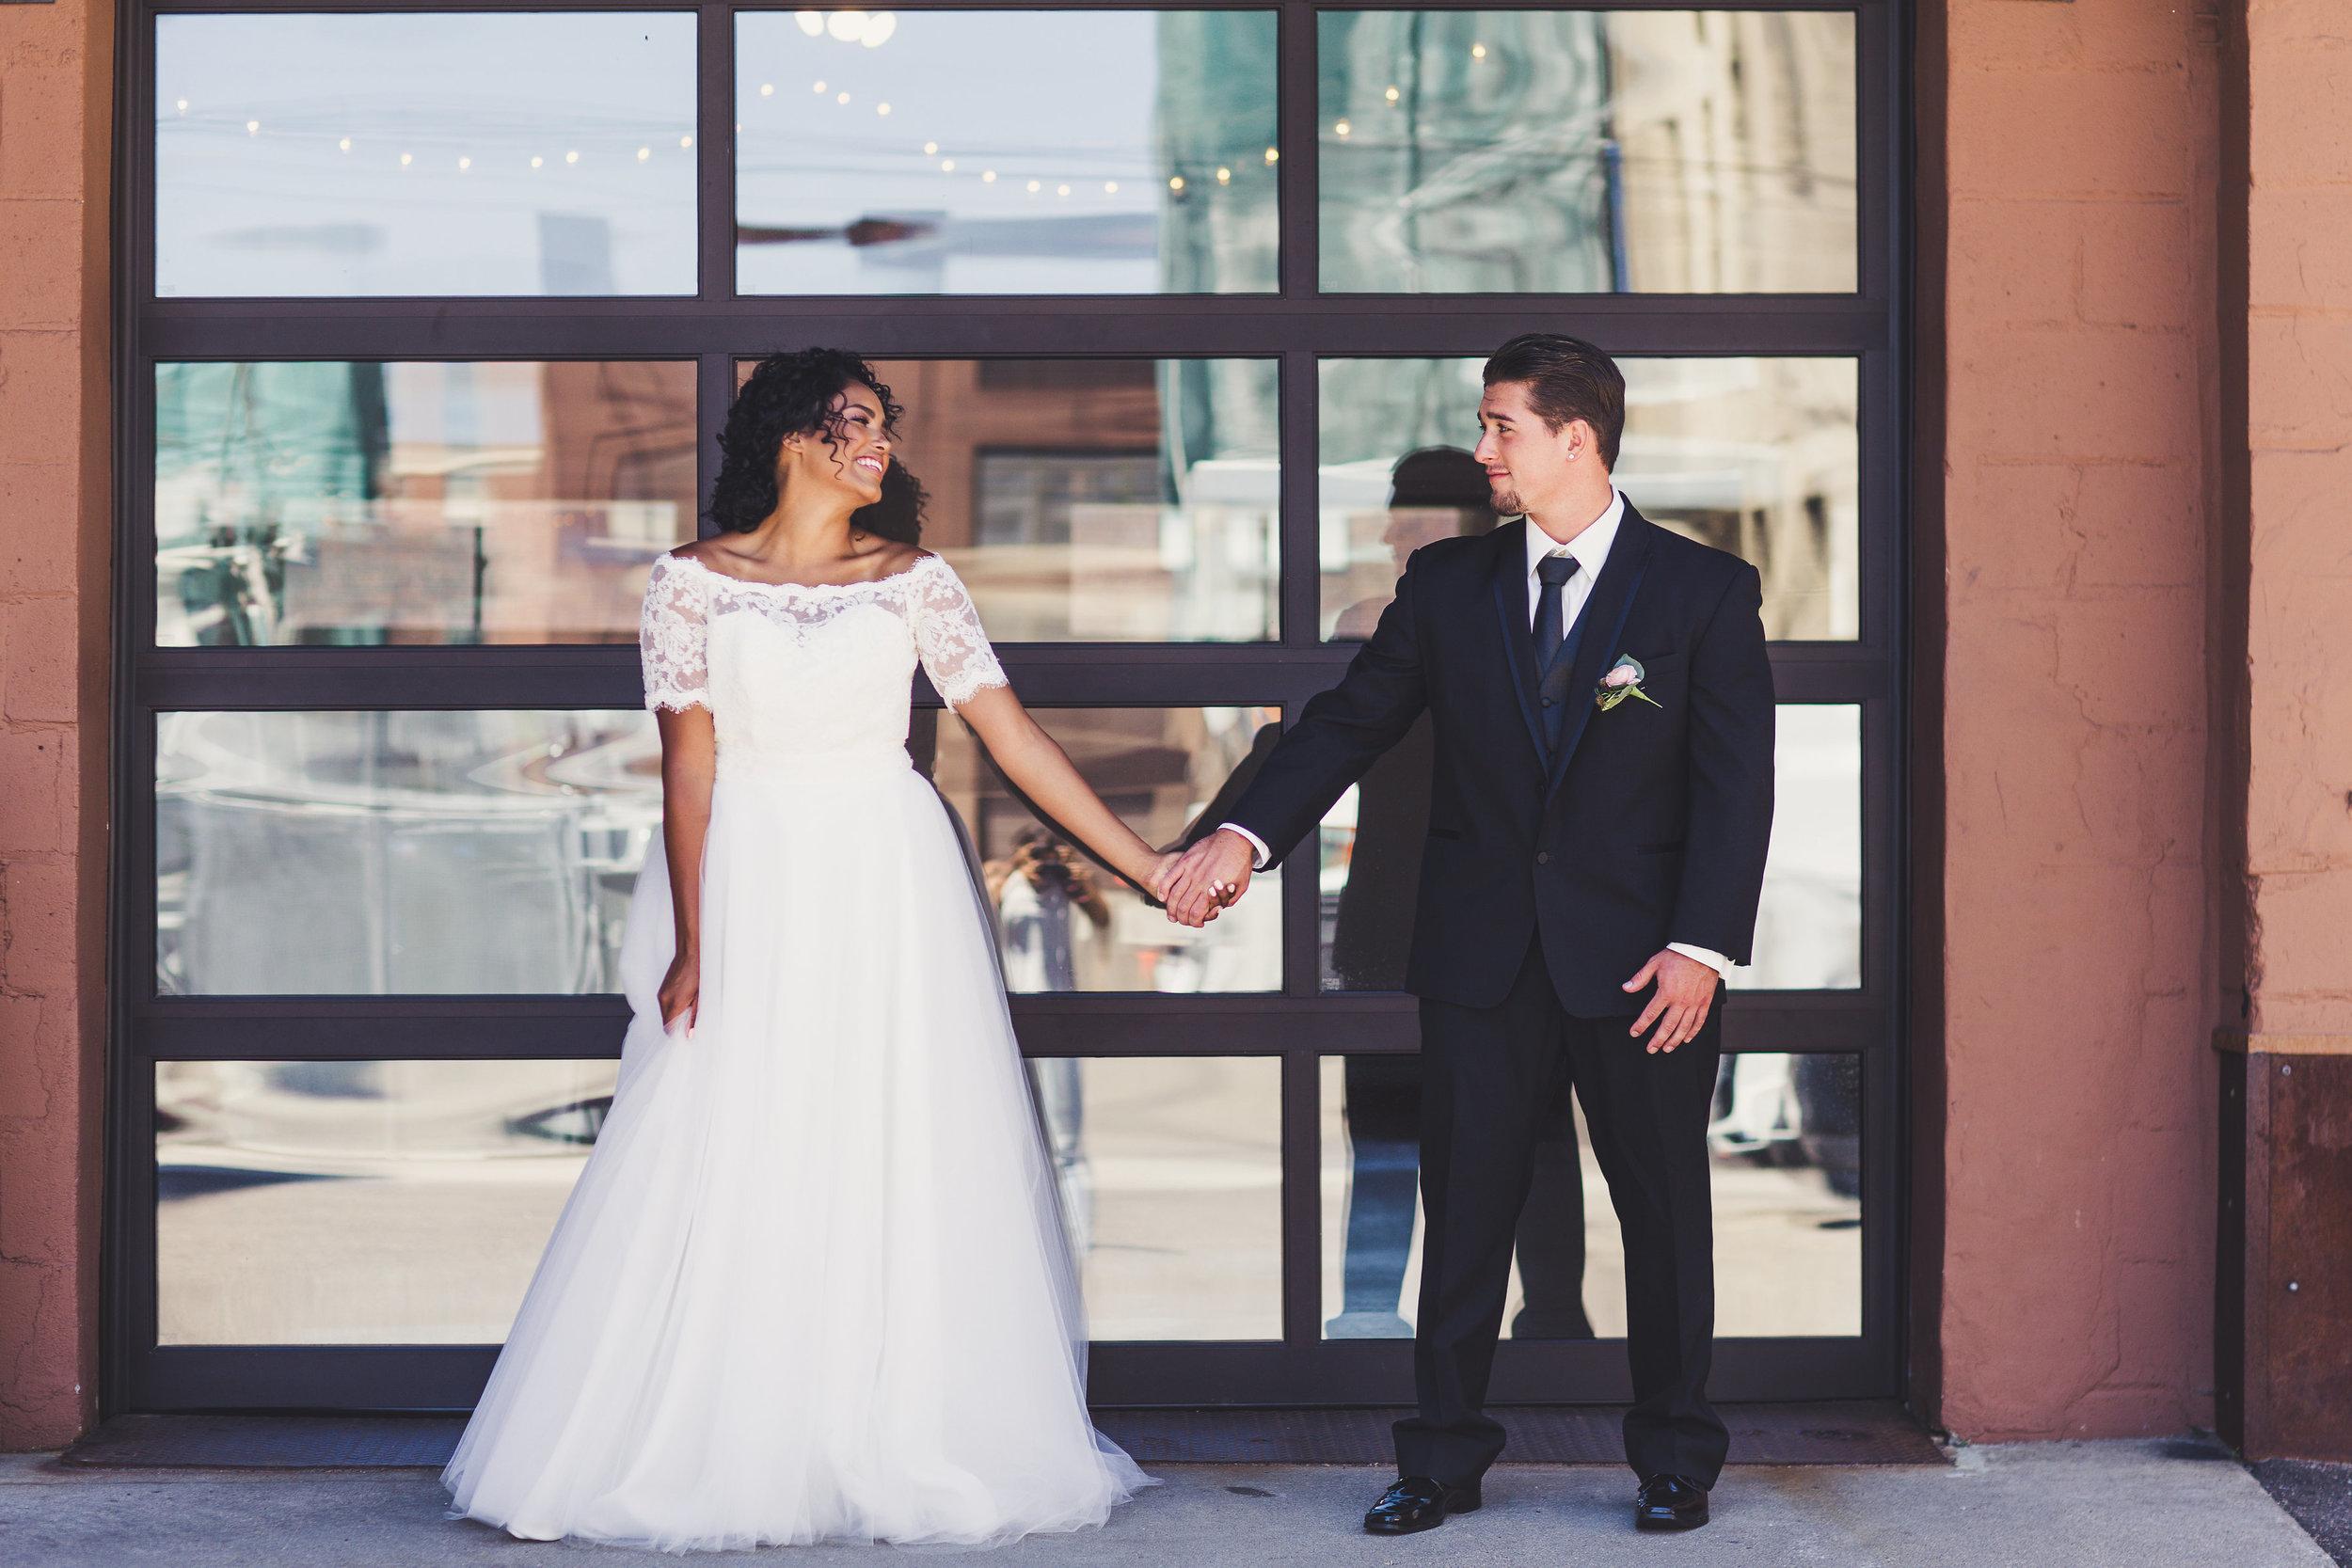 Wedding_Styled_Shoot_Minneapolis-129.jpg